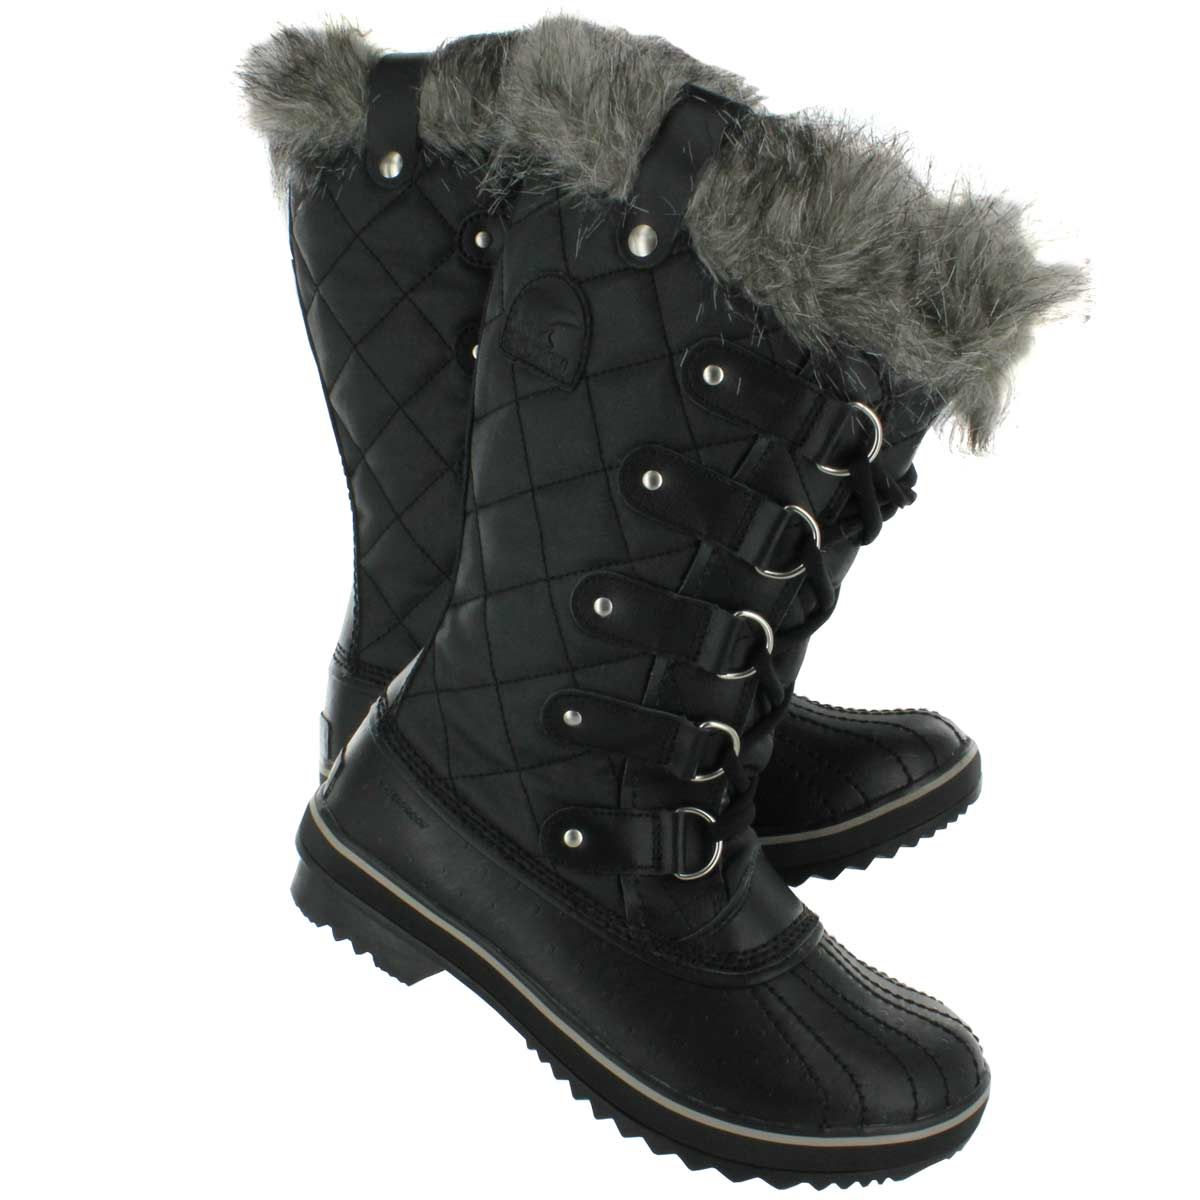 Ladies Winter Boots Clearance | Sorel Women's TOFINO CATE black ...